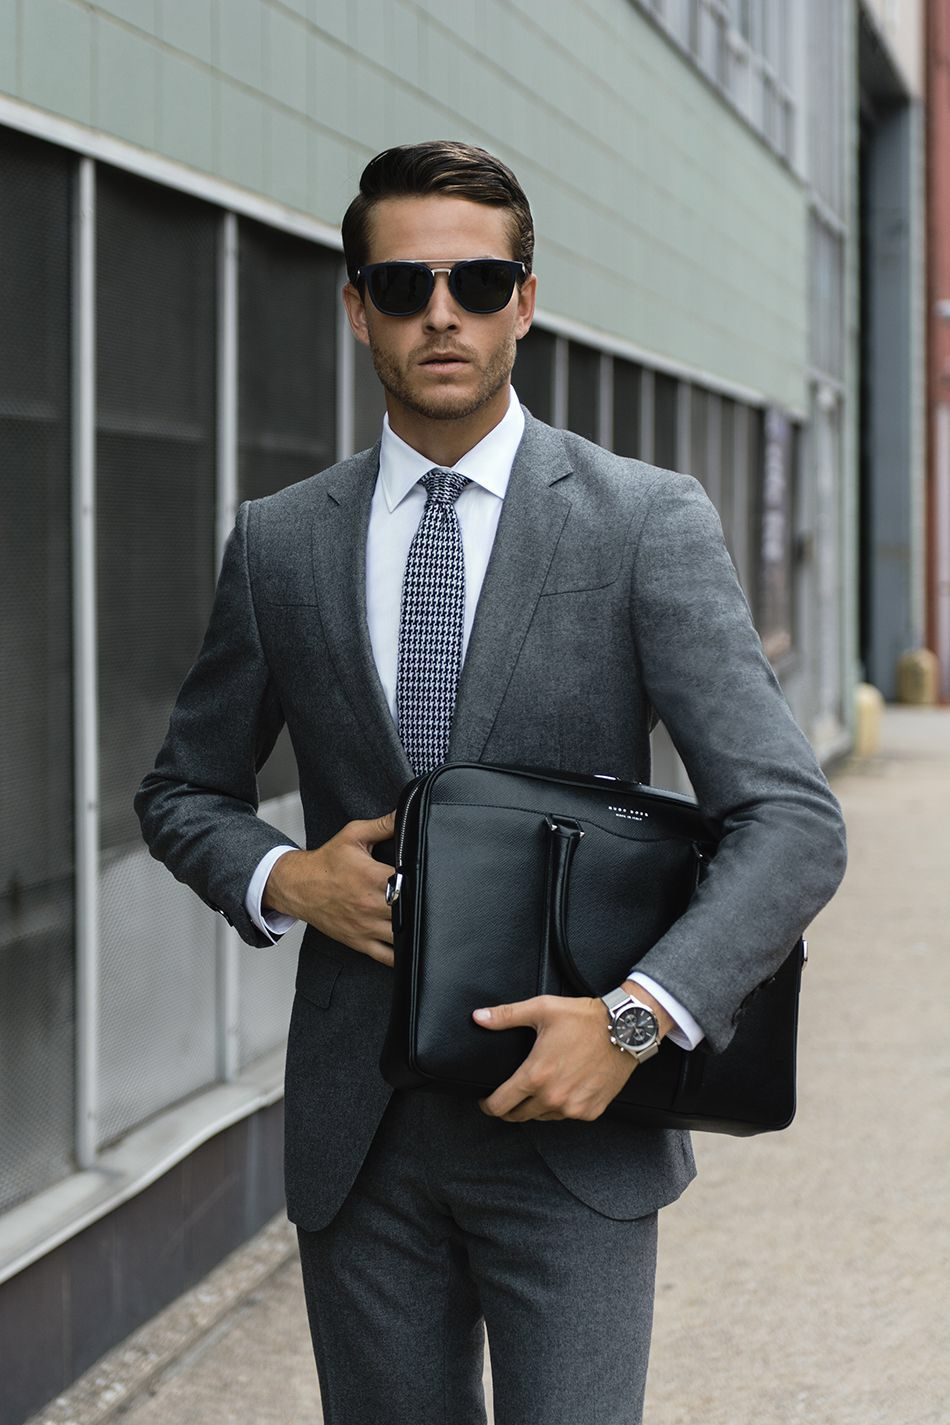 Galla Boss Business Attire For Men Suit Fashion Suits